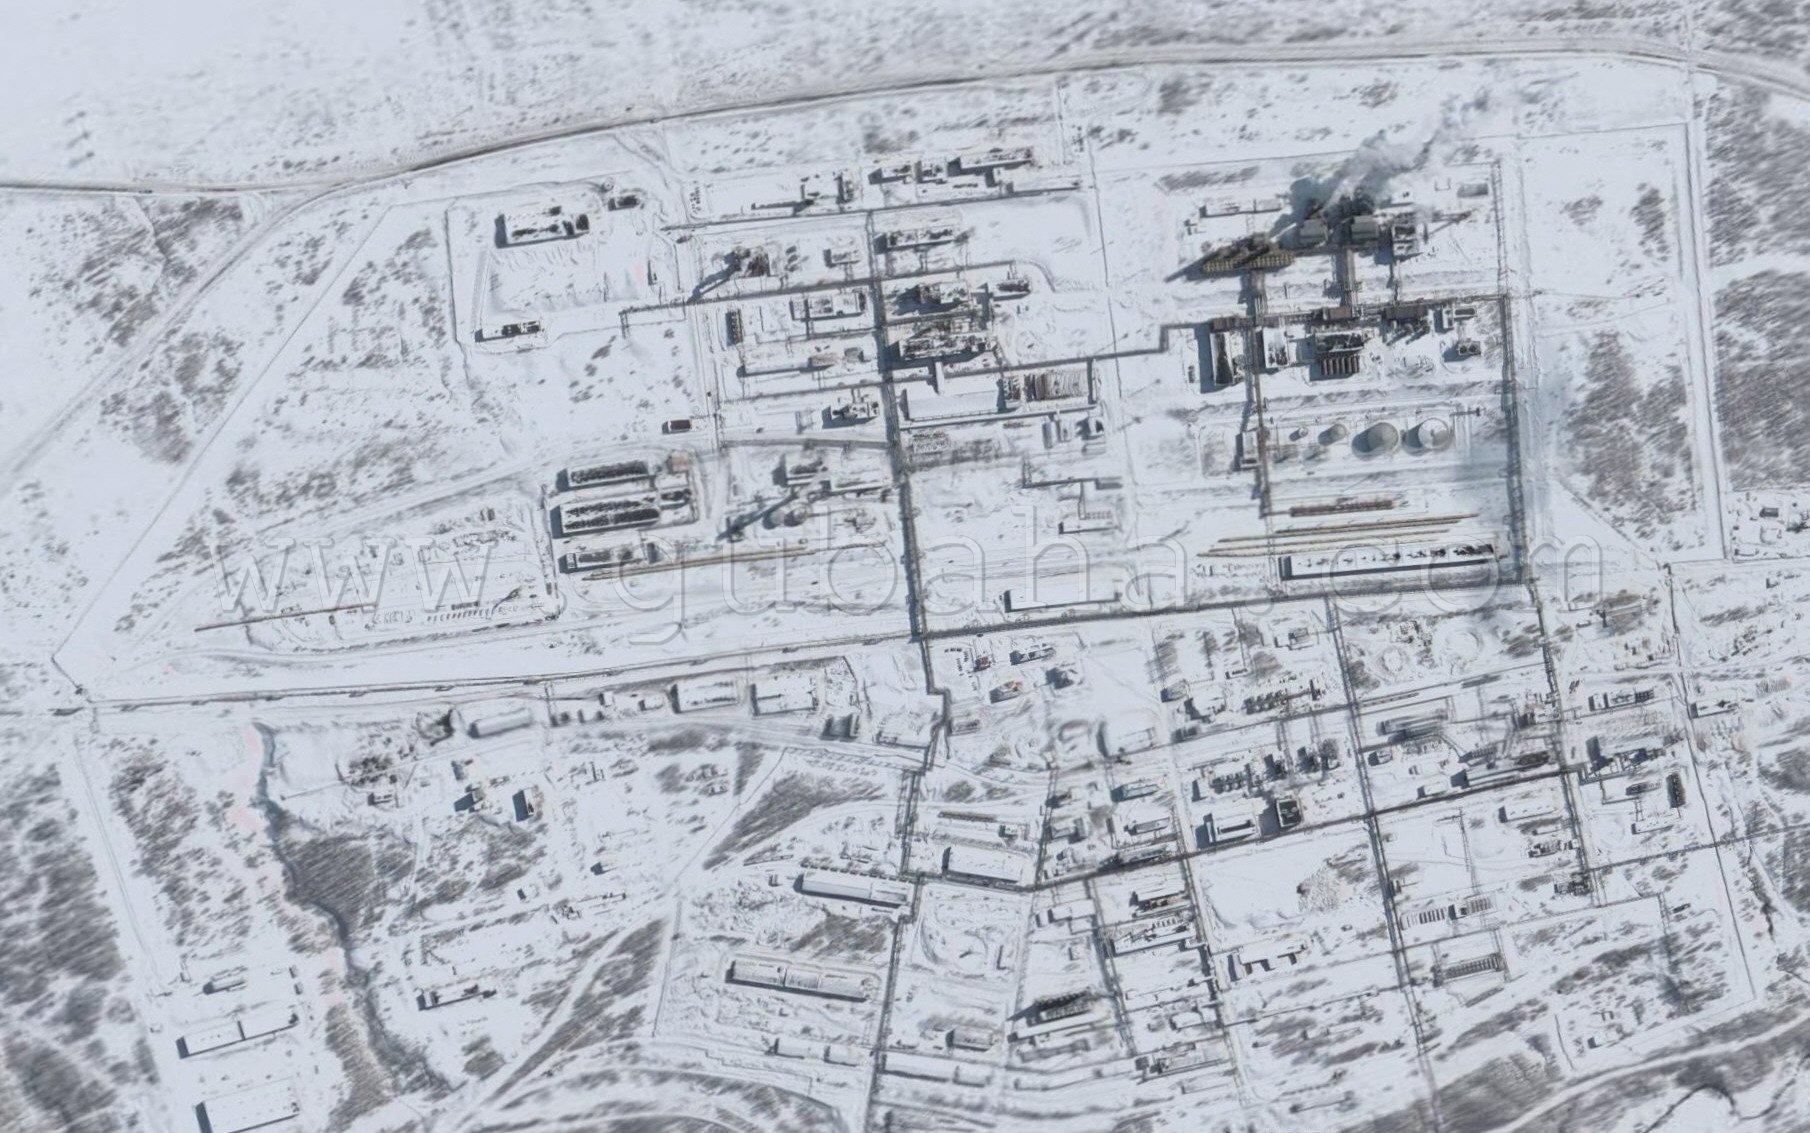 Губаха 023.jpg 2006 год Горнолыжный центр Губаха горные лыжи сноуборд Город Губаха Фото ОАО Метафракс (большое фото)